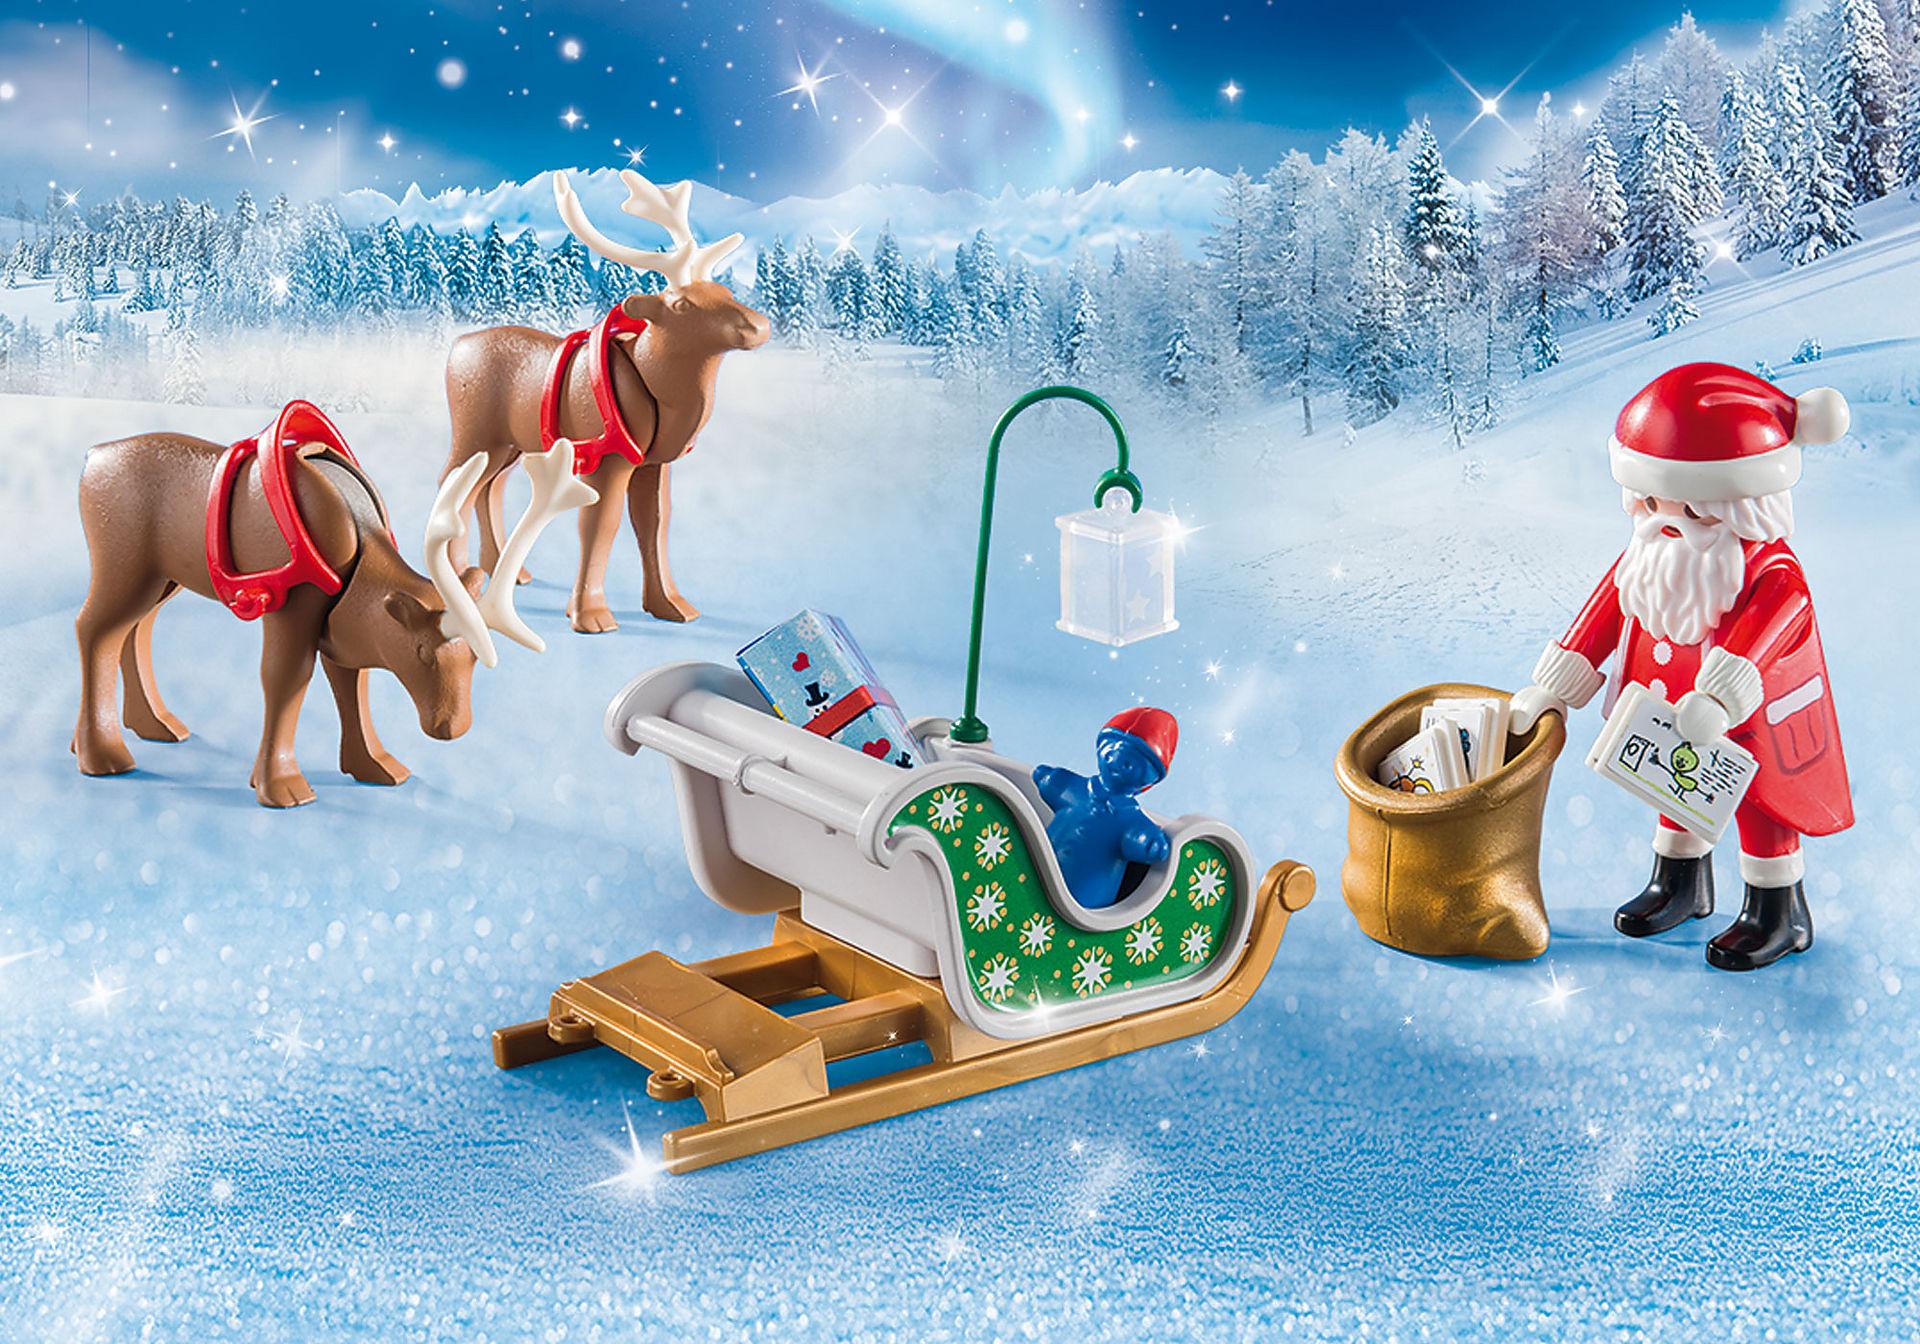 http://media.playmobil.com/i/playmobil/9496_product_extra1/Santa's Sleigh with Reindeer